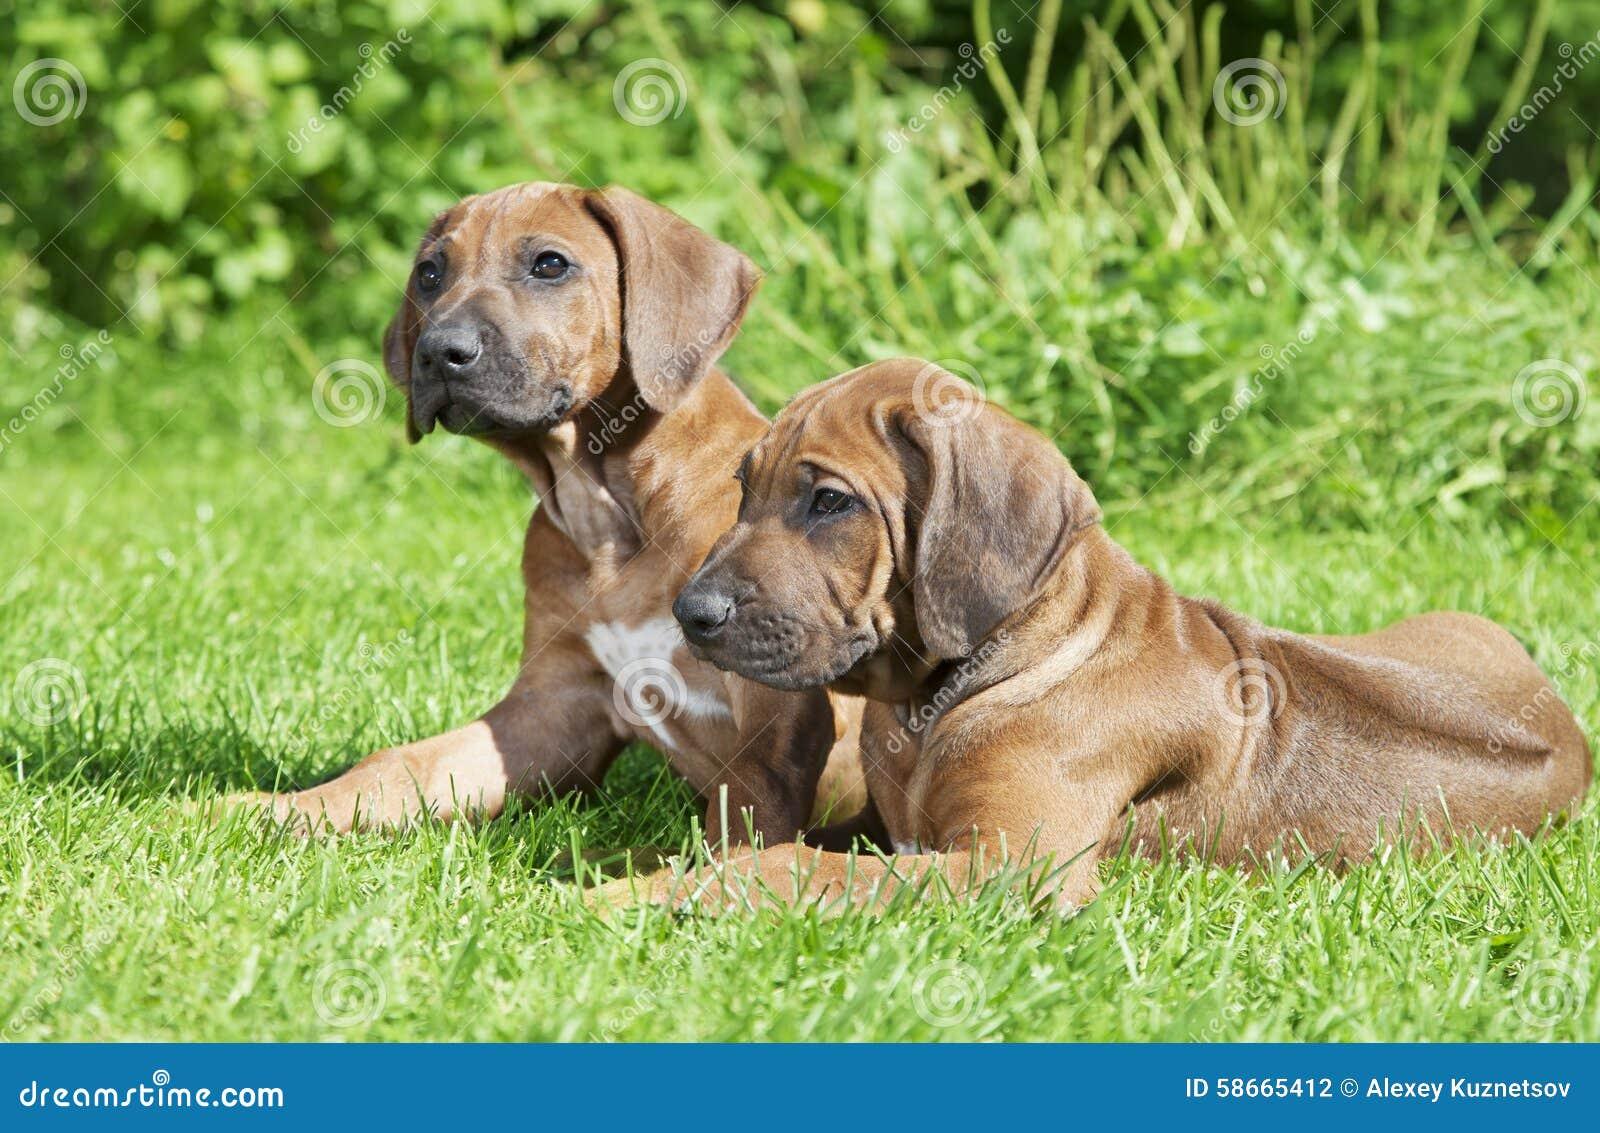 Short haired Rhodesian Ridgeback puppies outdoors